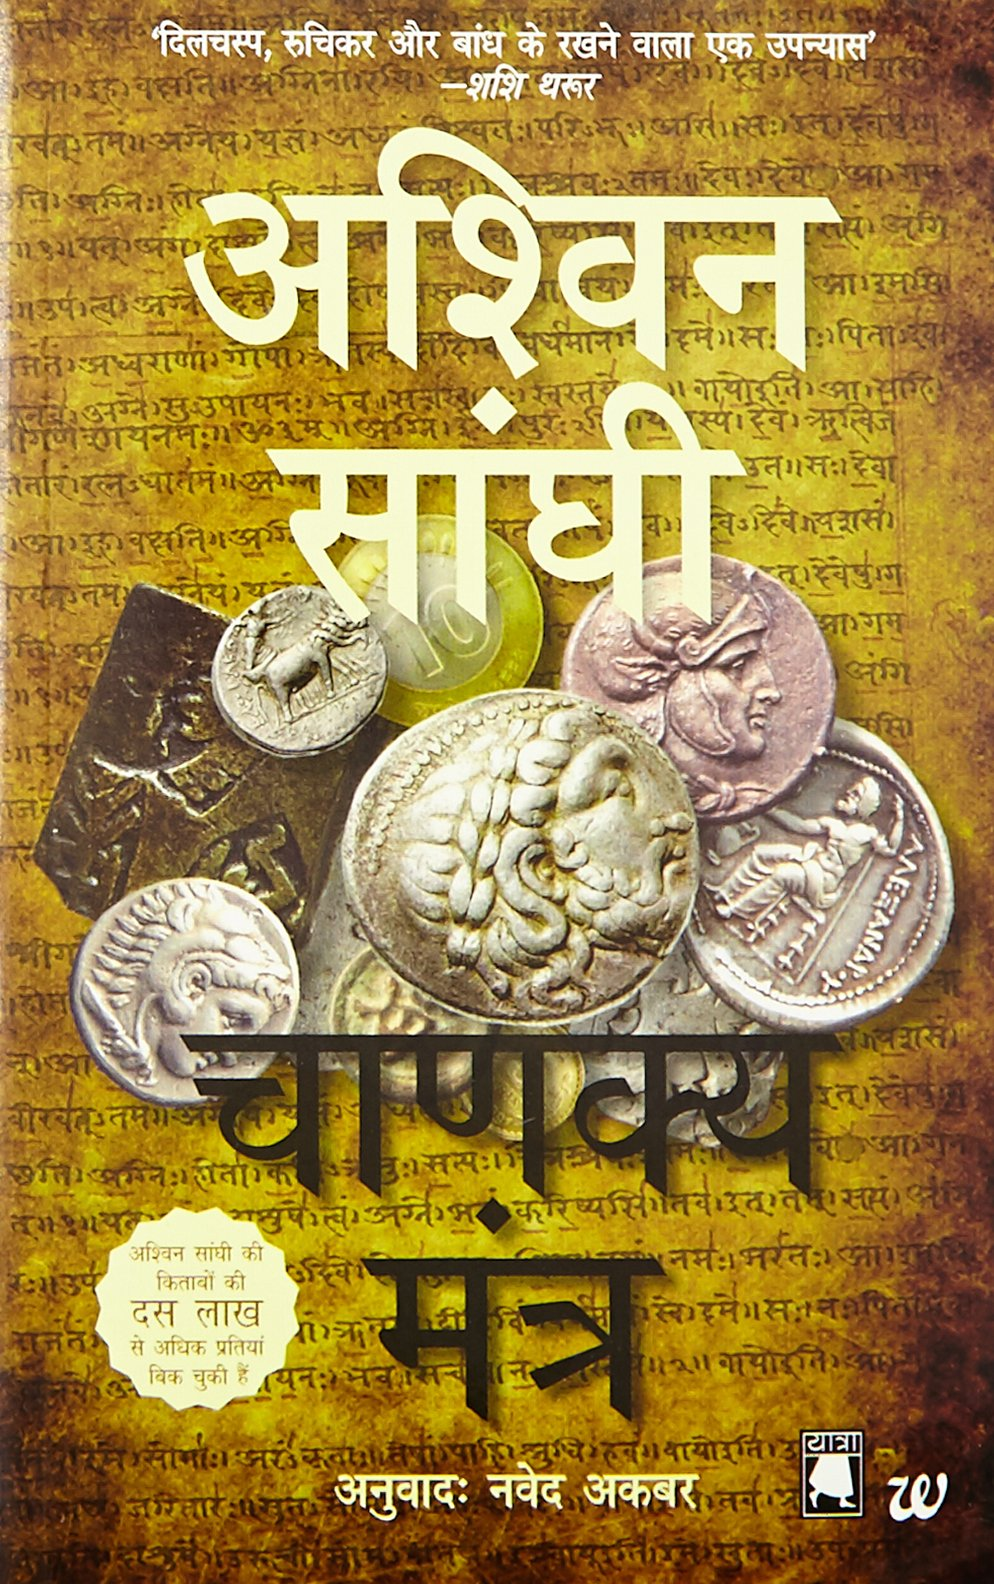 Image result for chanakya mantra